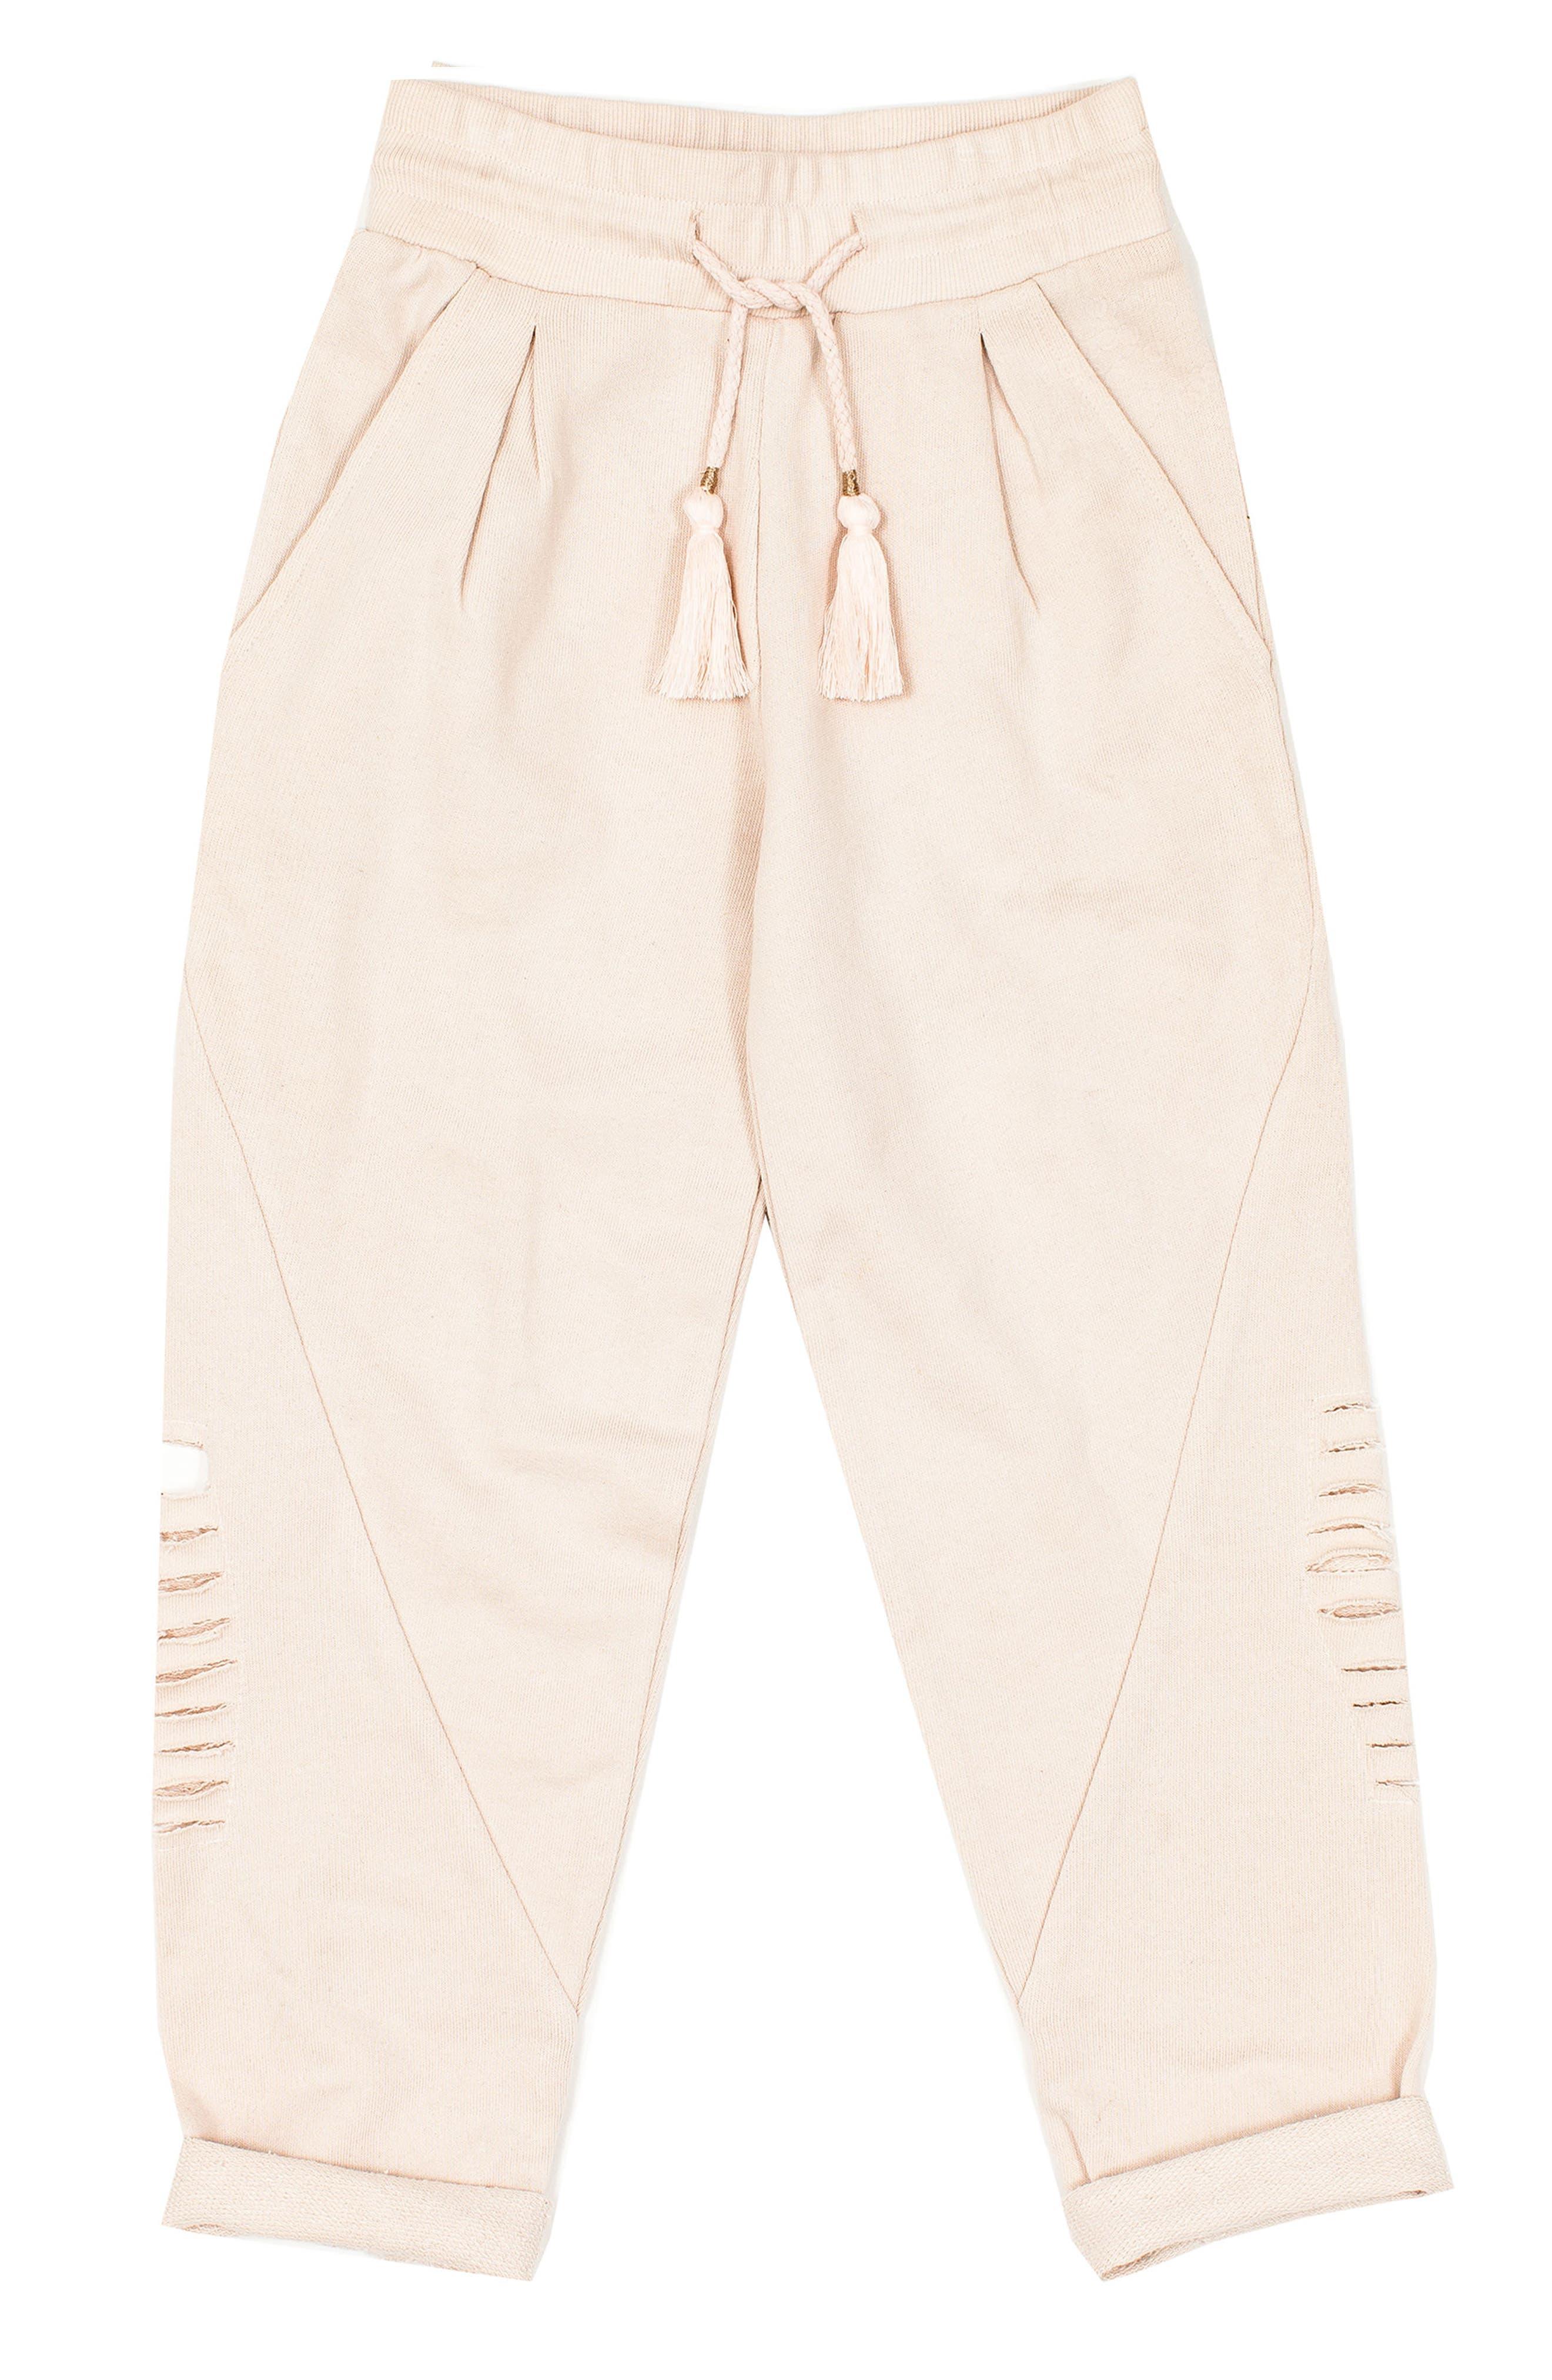 Alchemy Distressed Sweatpants,                         Main,                         color, Stardust